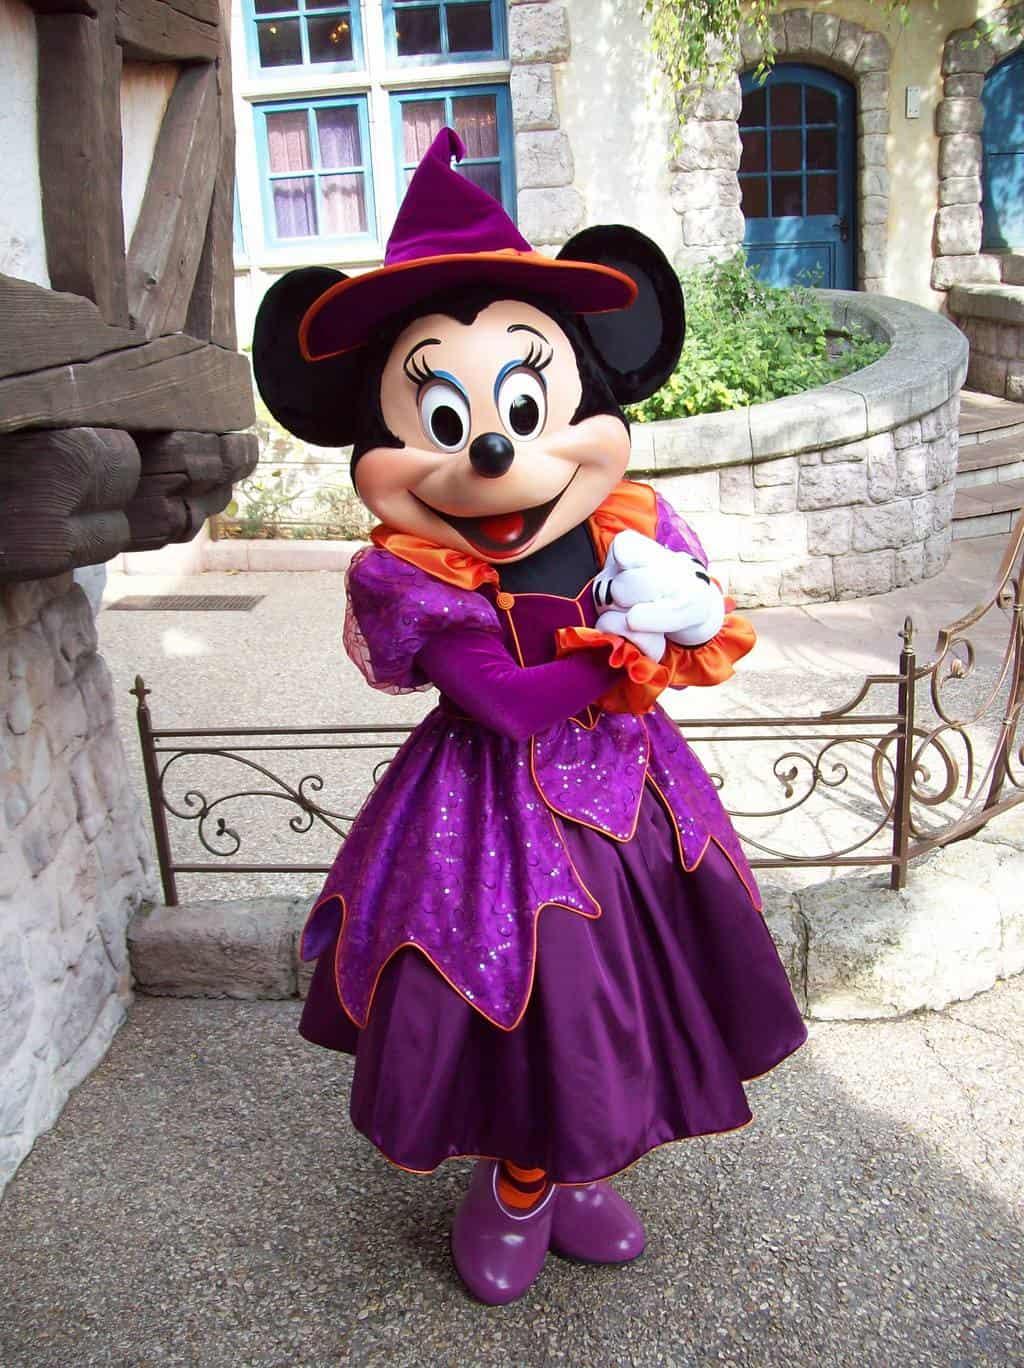 Minnie wearing her beautiful purple Halloween dress.